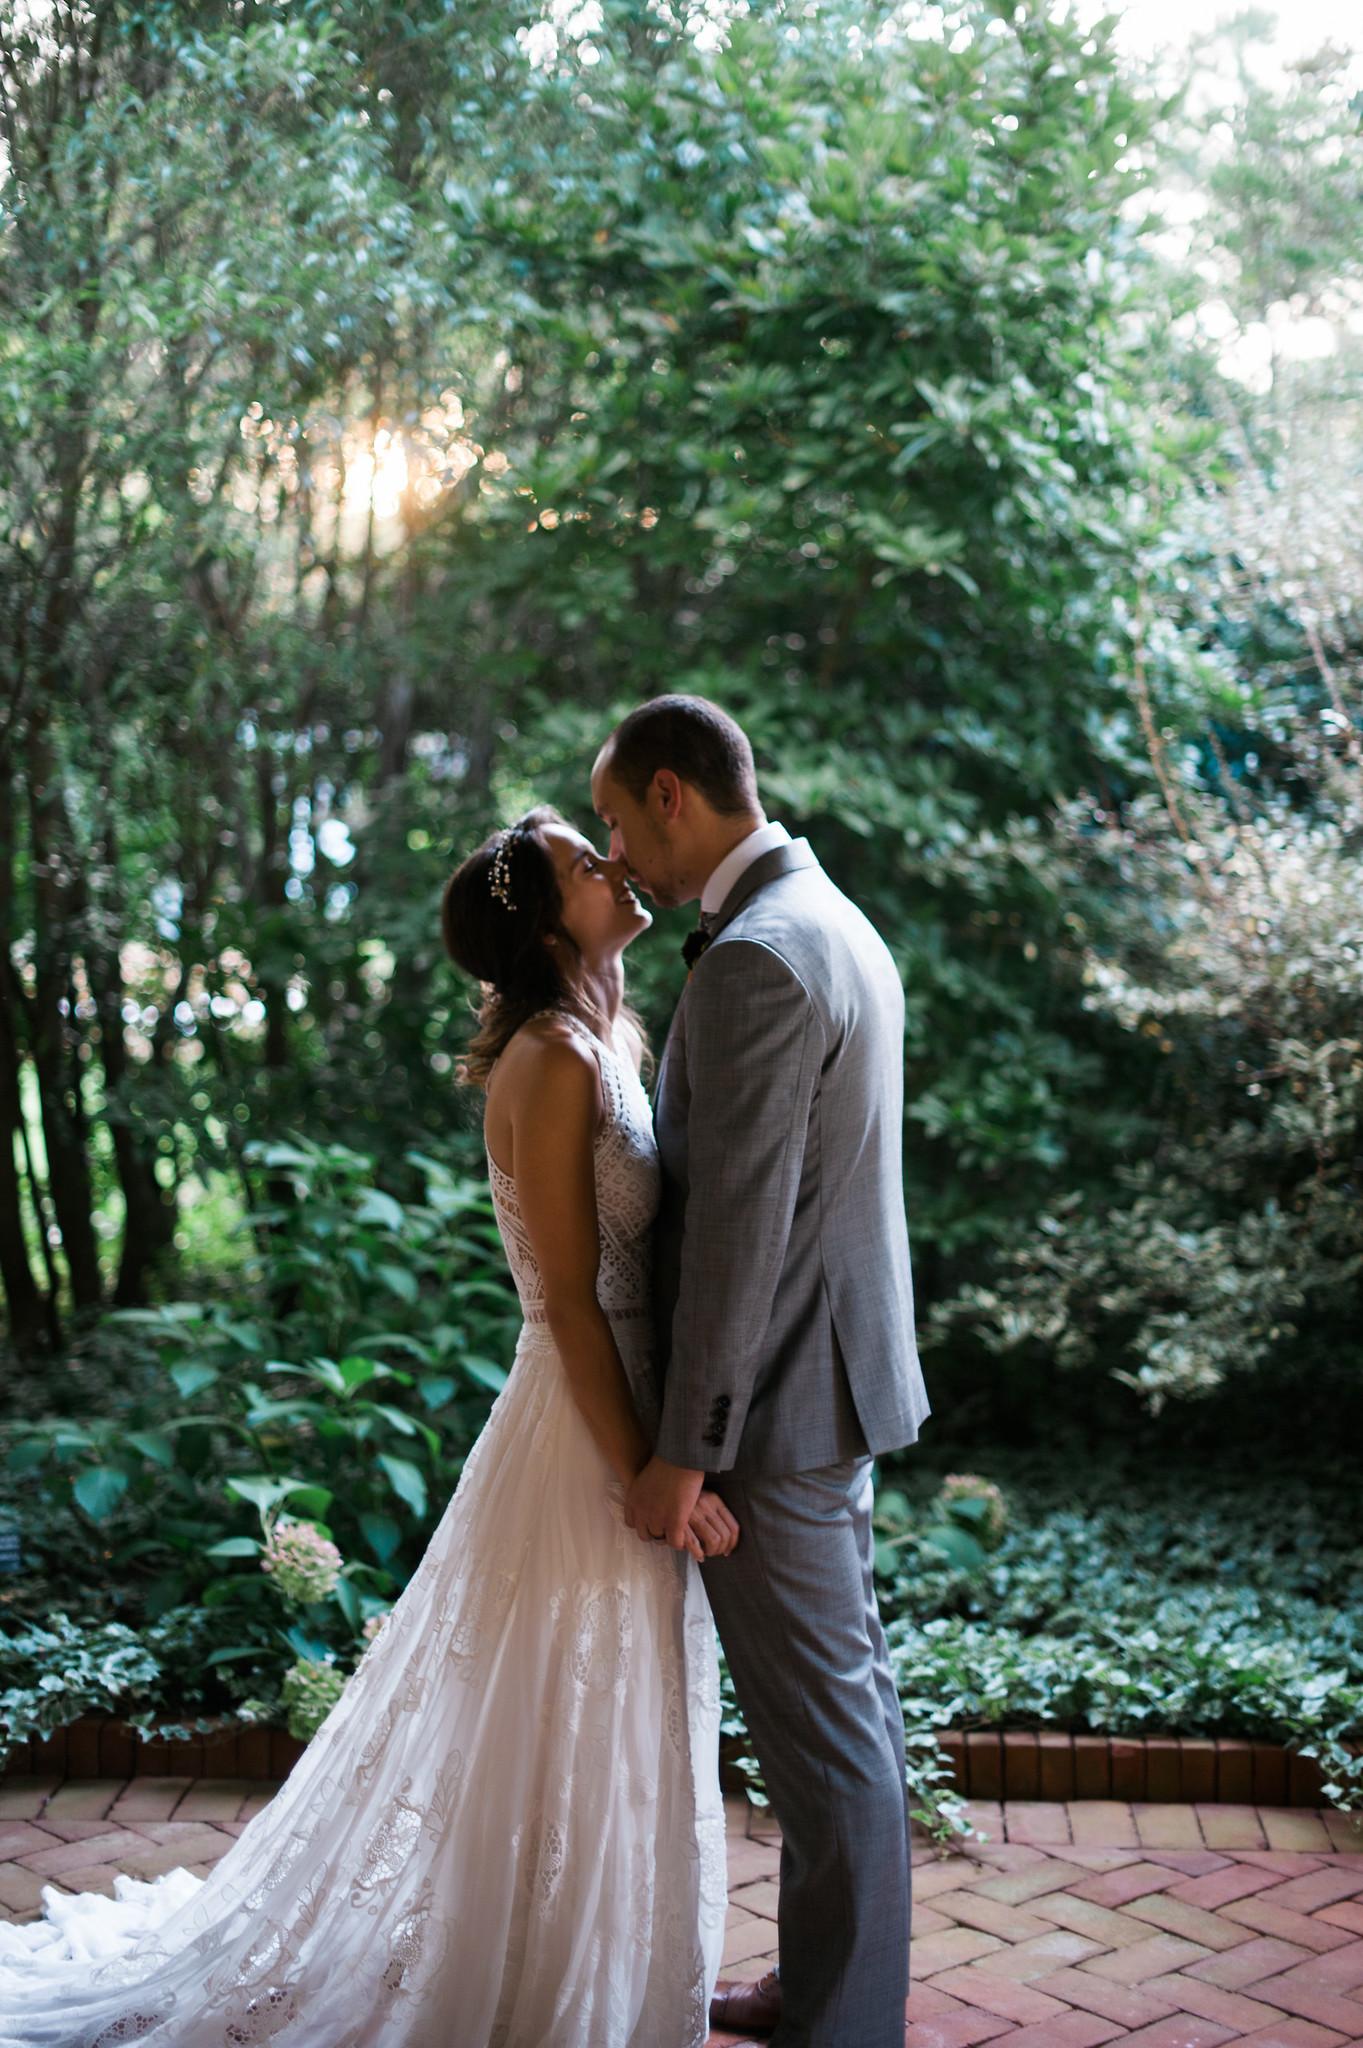 thomas-wedding-333-X4.jpg